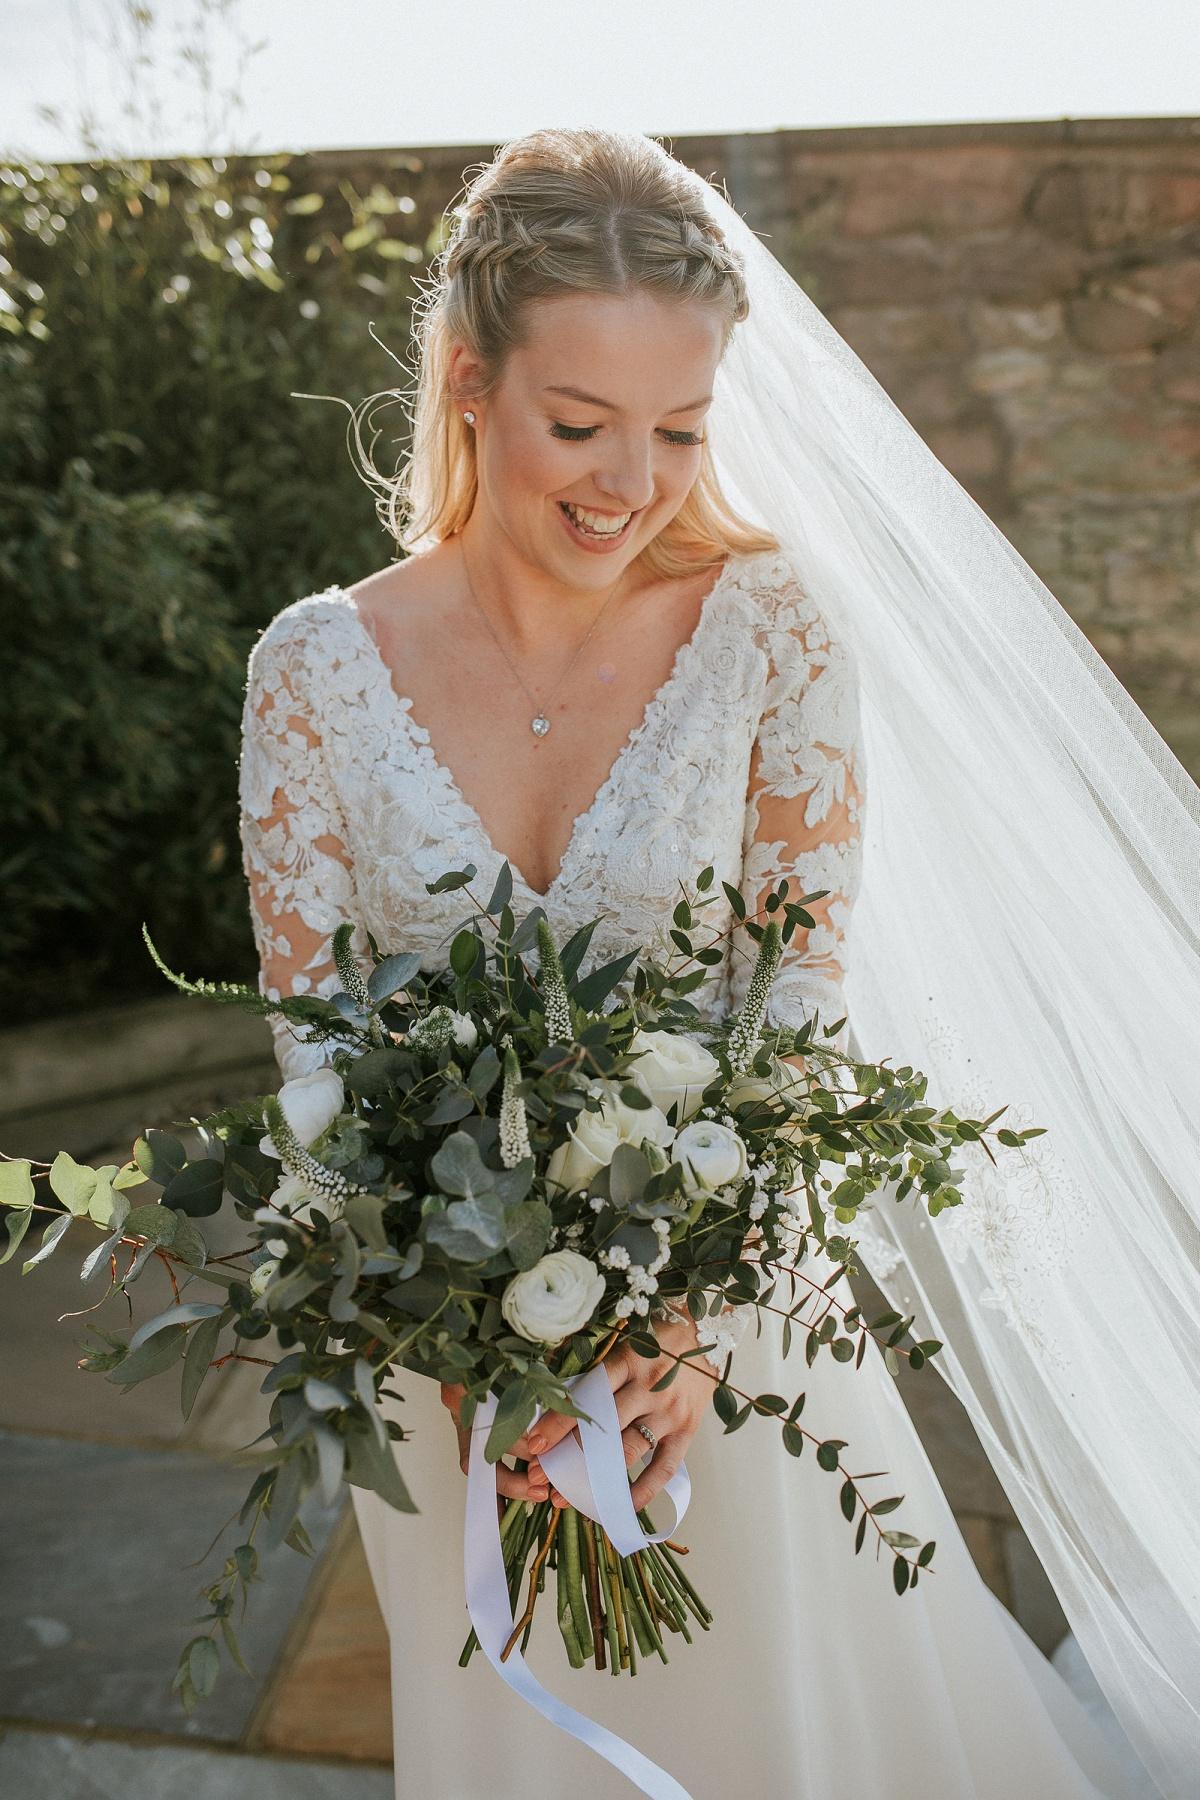 Jack and Hannah's Wedding 22/02/2020